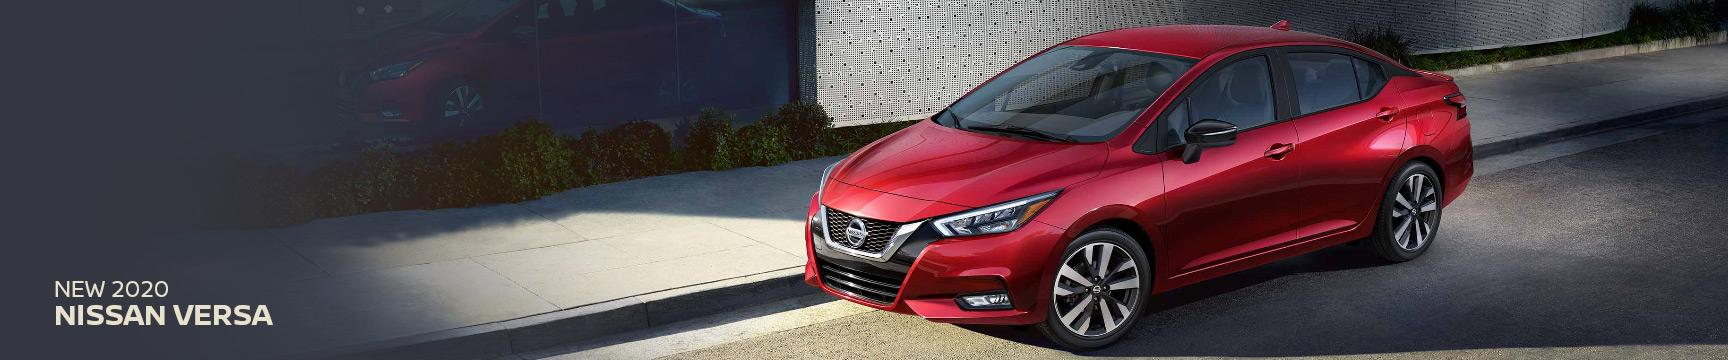 Experience the All-New 2020 Nissan Versa in Buford, GA, near Atlanta